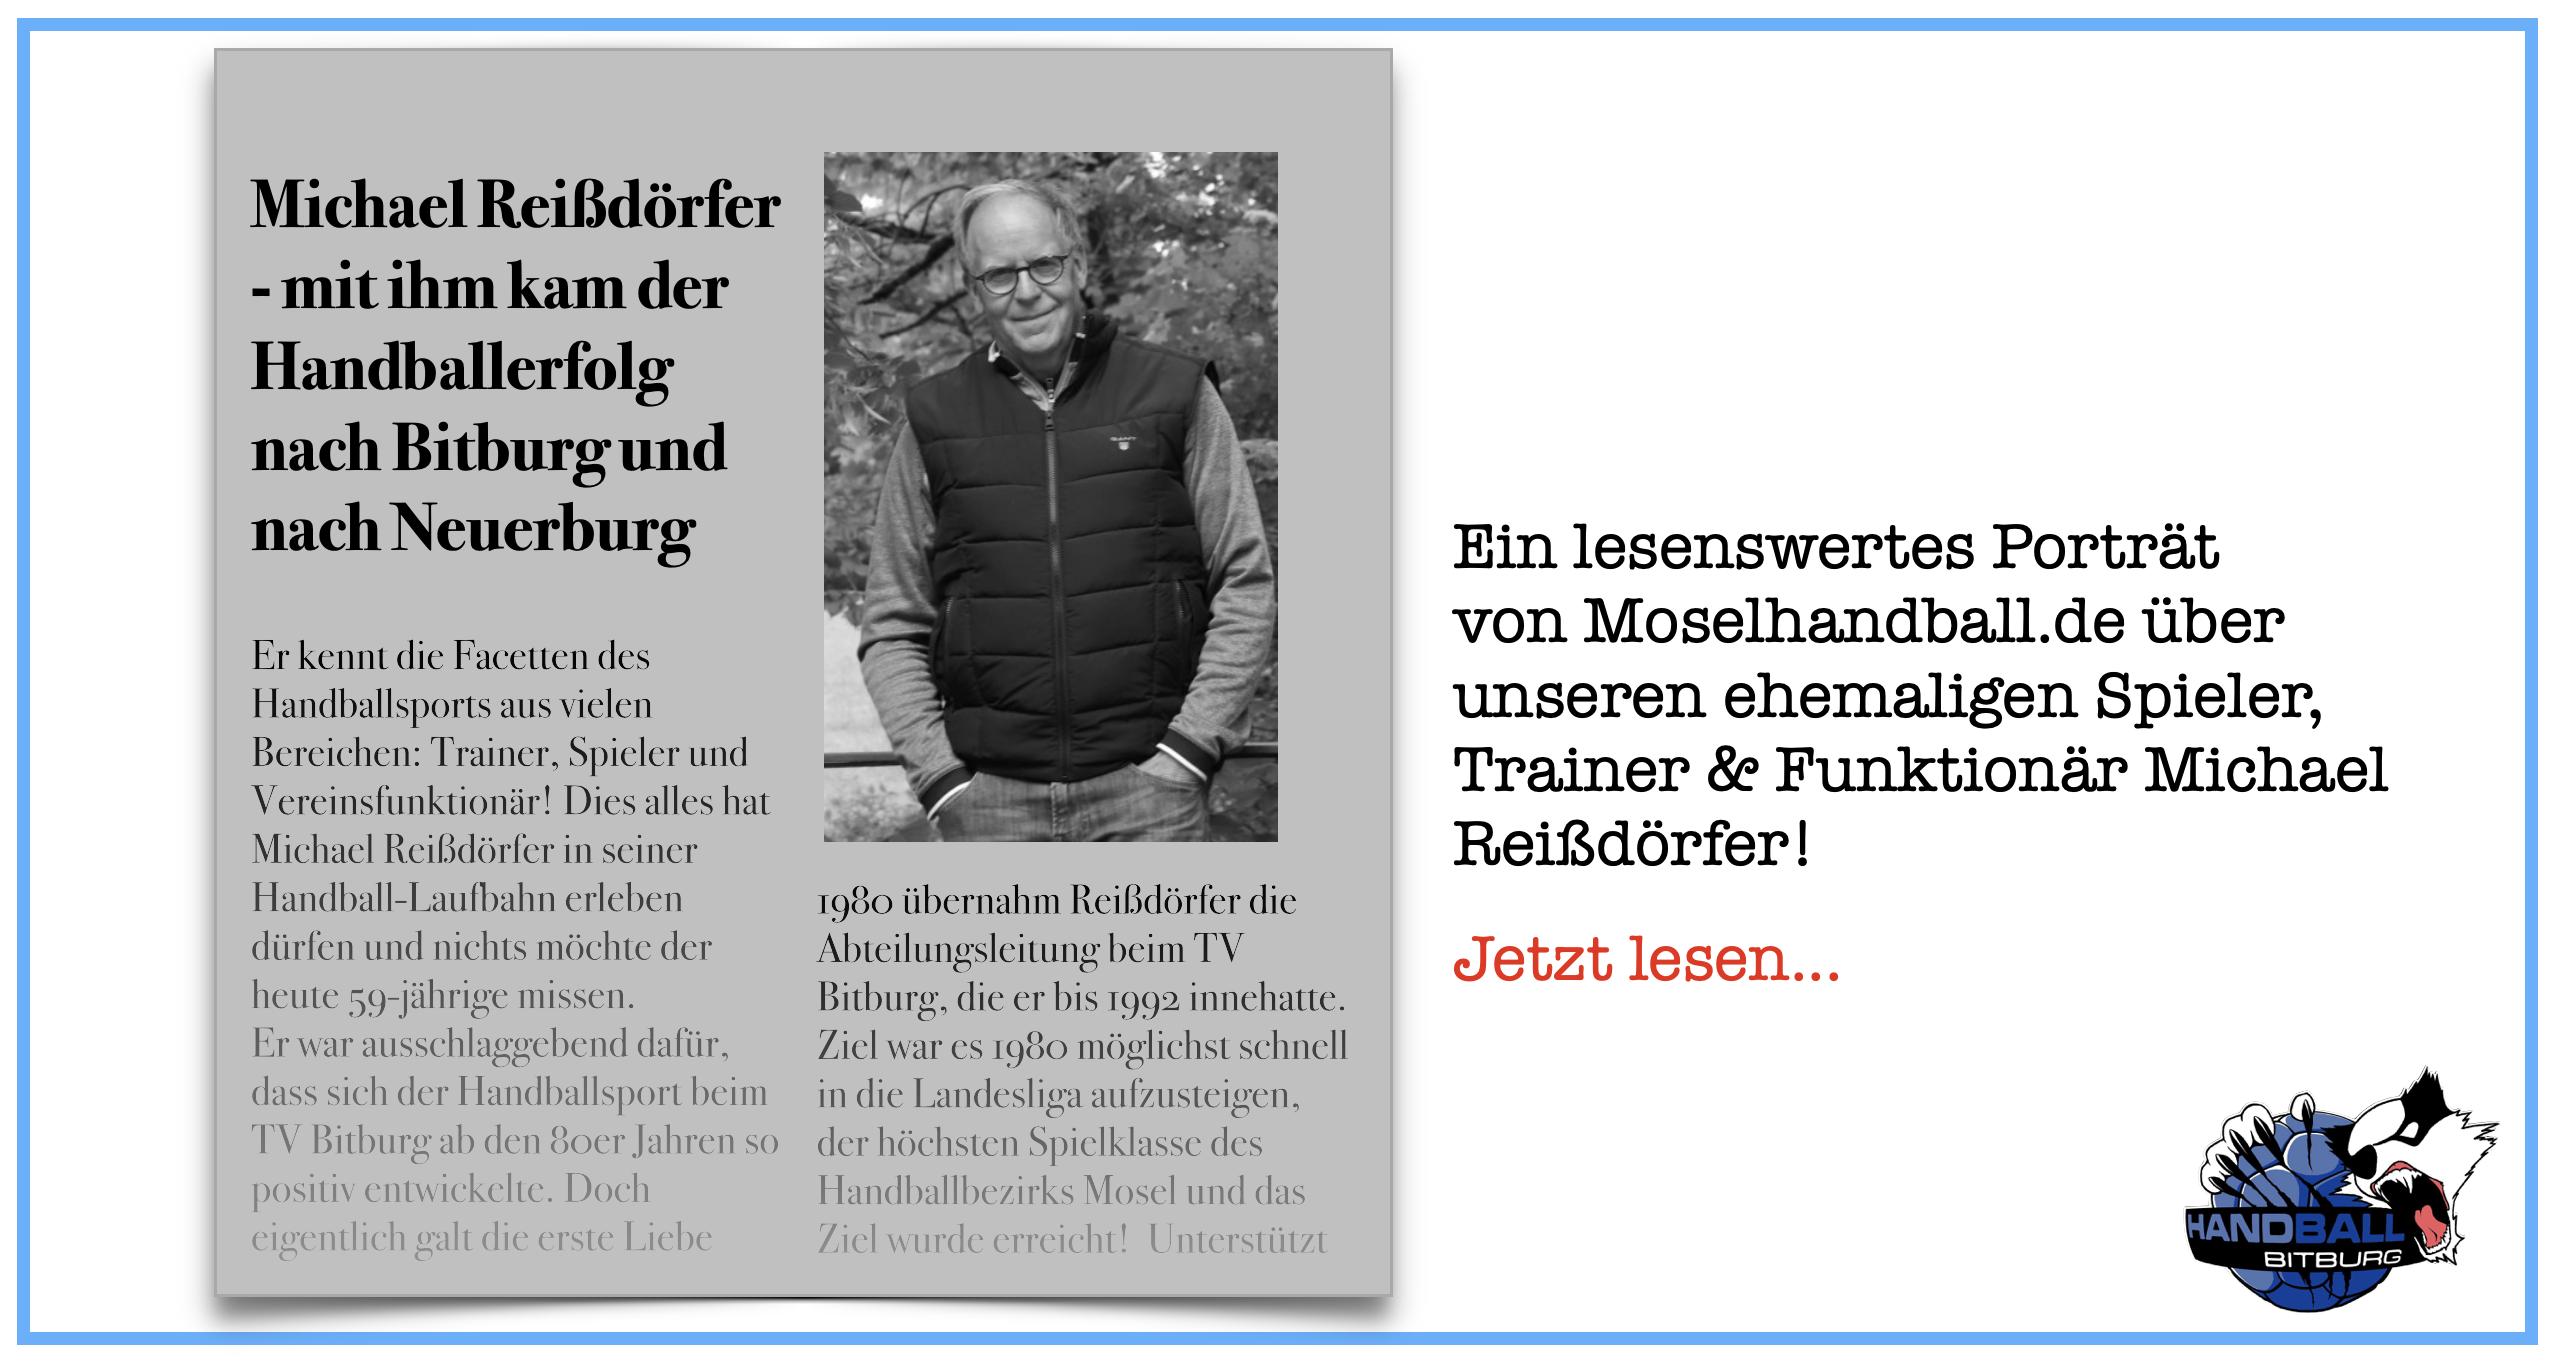 Im Moselhandball-Portrait: Michael Reißdörfer